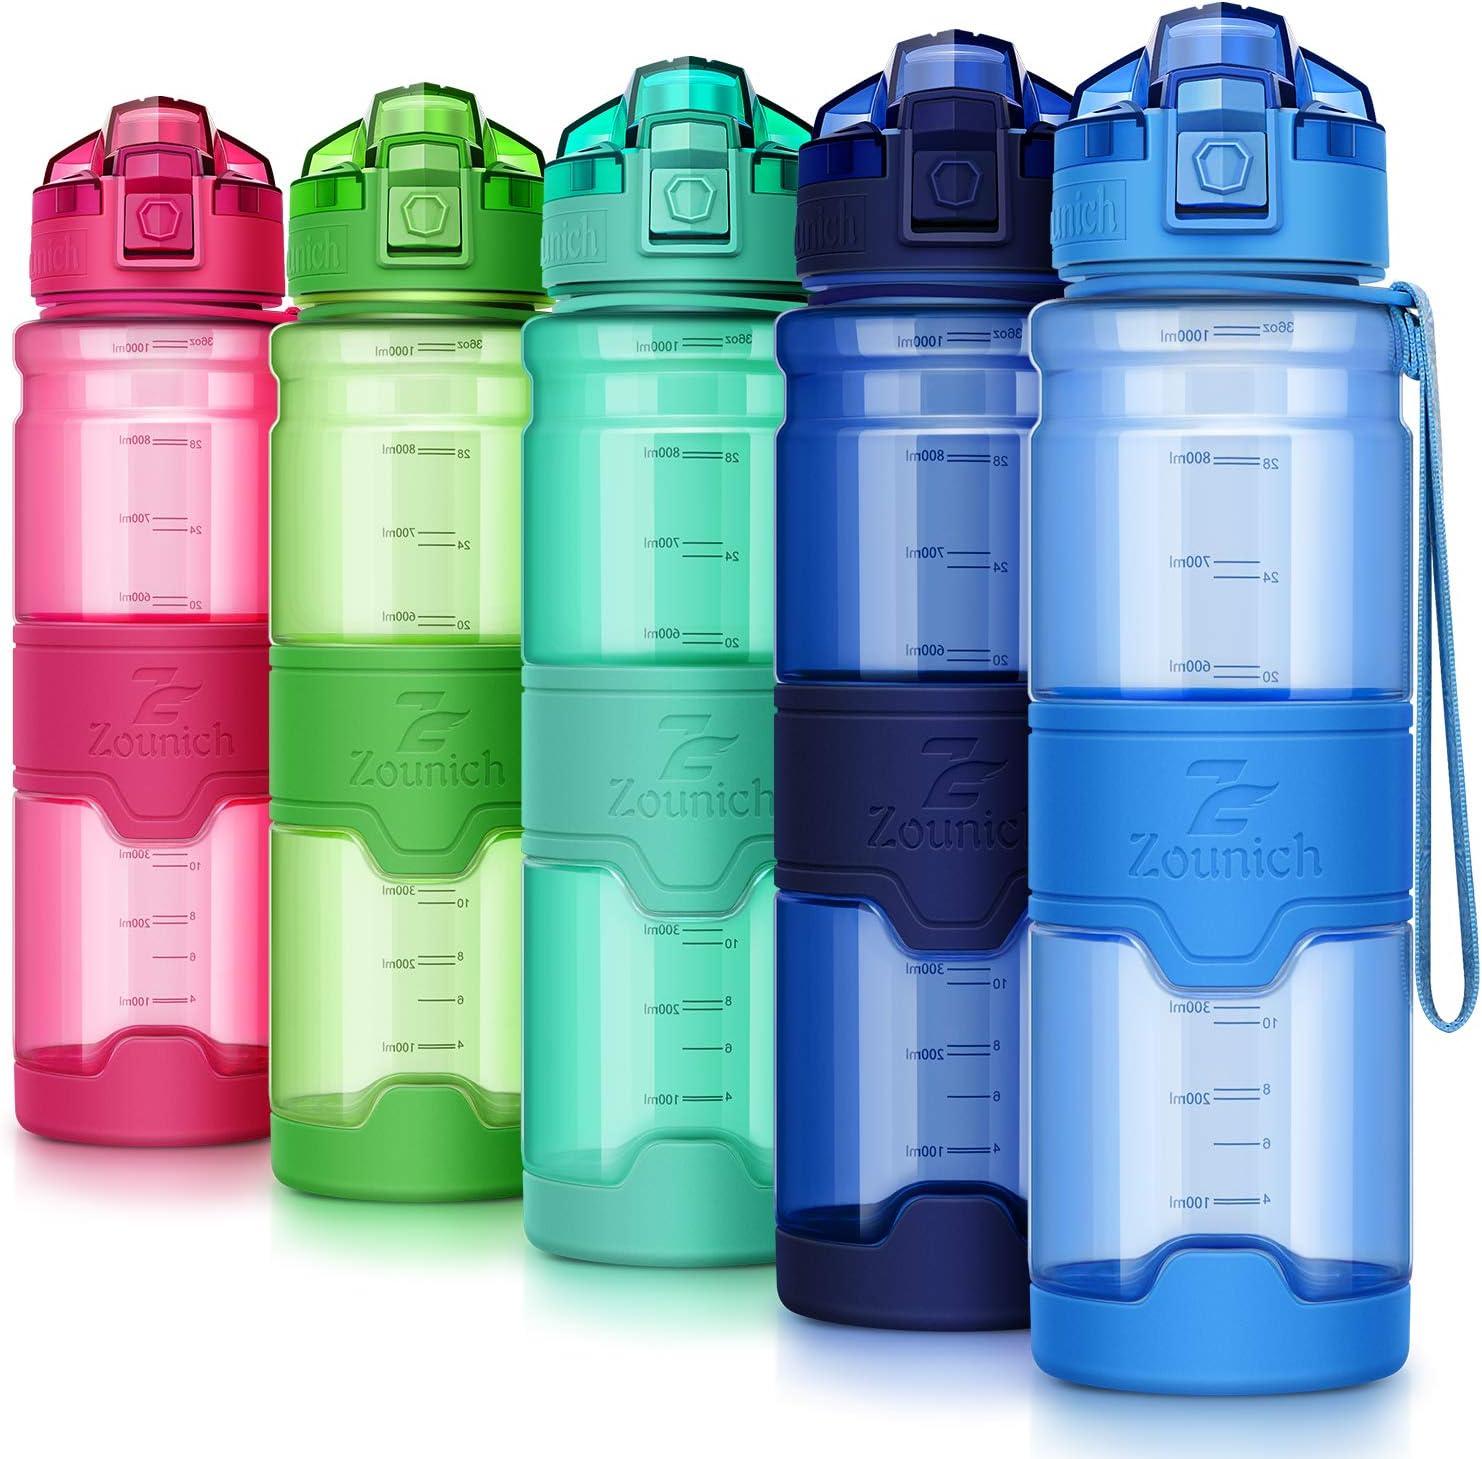 Reutilizable Tritan Pl/ástico Ecologica con Filtro 400ml//500ml700ml//1l Colegio Viajes Bicicleta ZOUNICH Botella Agua Deporte Botellas Agua Ni/ños sin BPA Oficina Cantimploras para Gimnasio